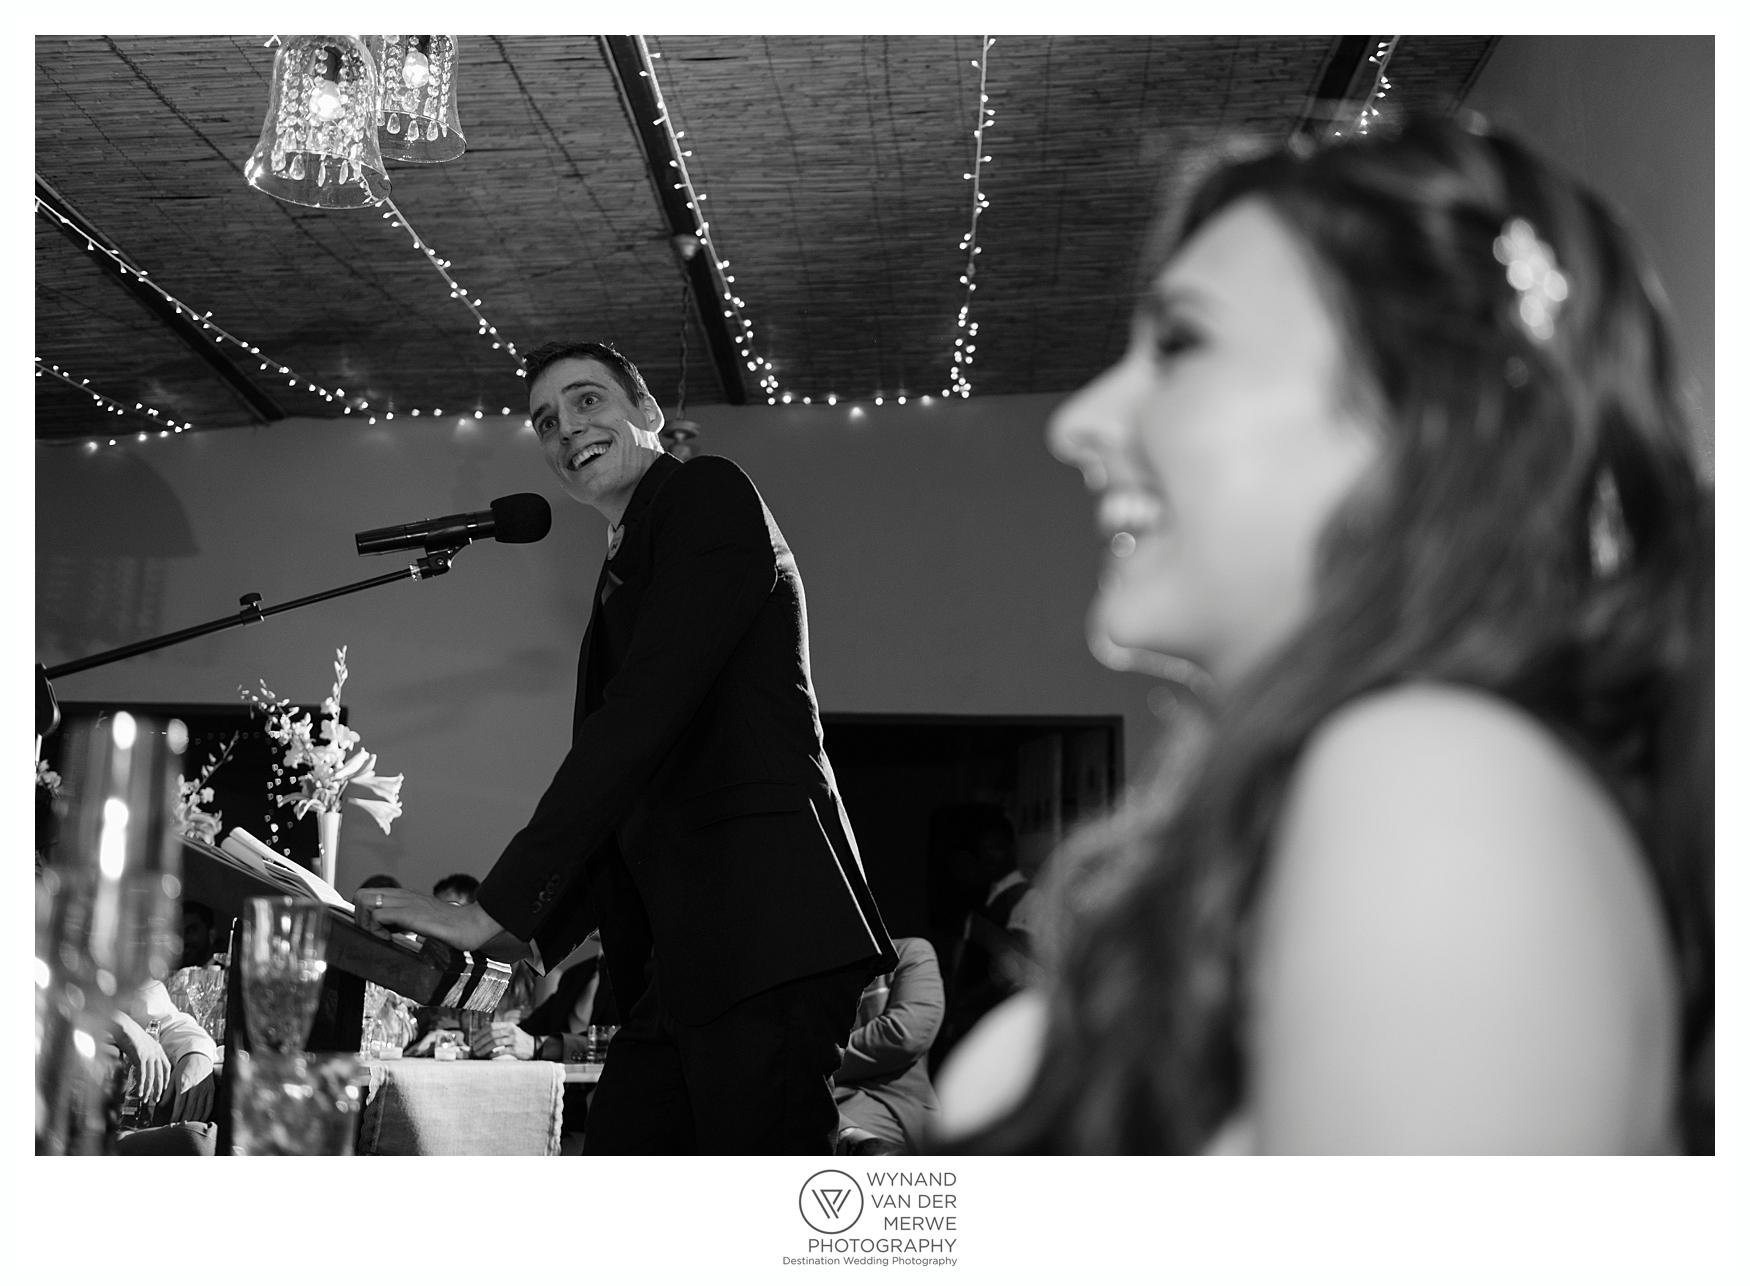 Wynandvandermerwe ryan natalia wedding photography cradle valley guesthouse gauteng-682.jpg